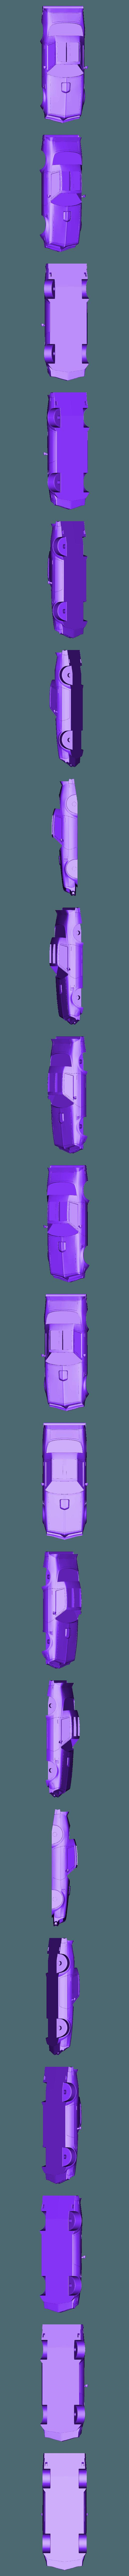 Body.stl Download free STL file Trans-Am 1977 • 3D printing design, Double_Alfa_3D